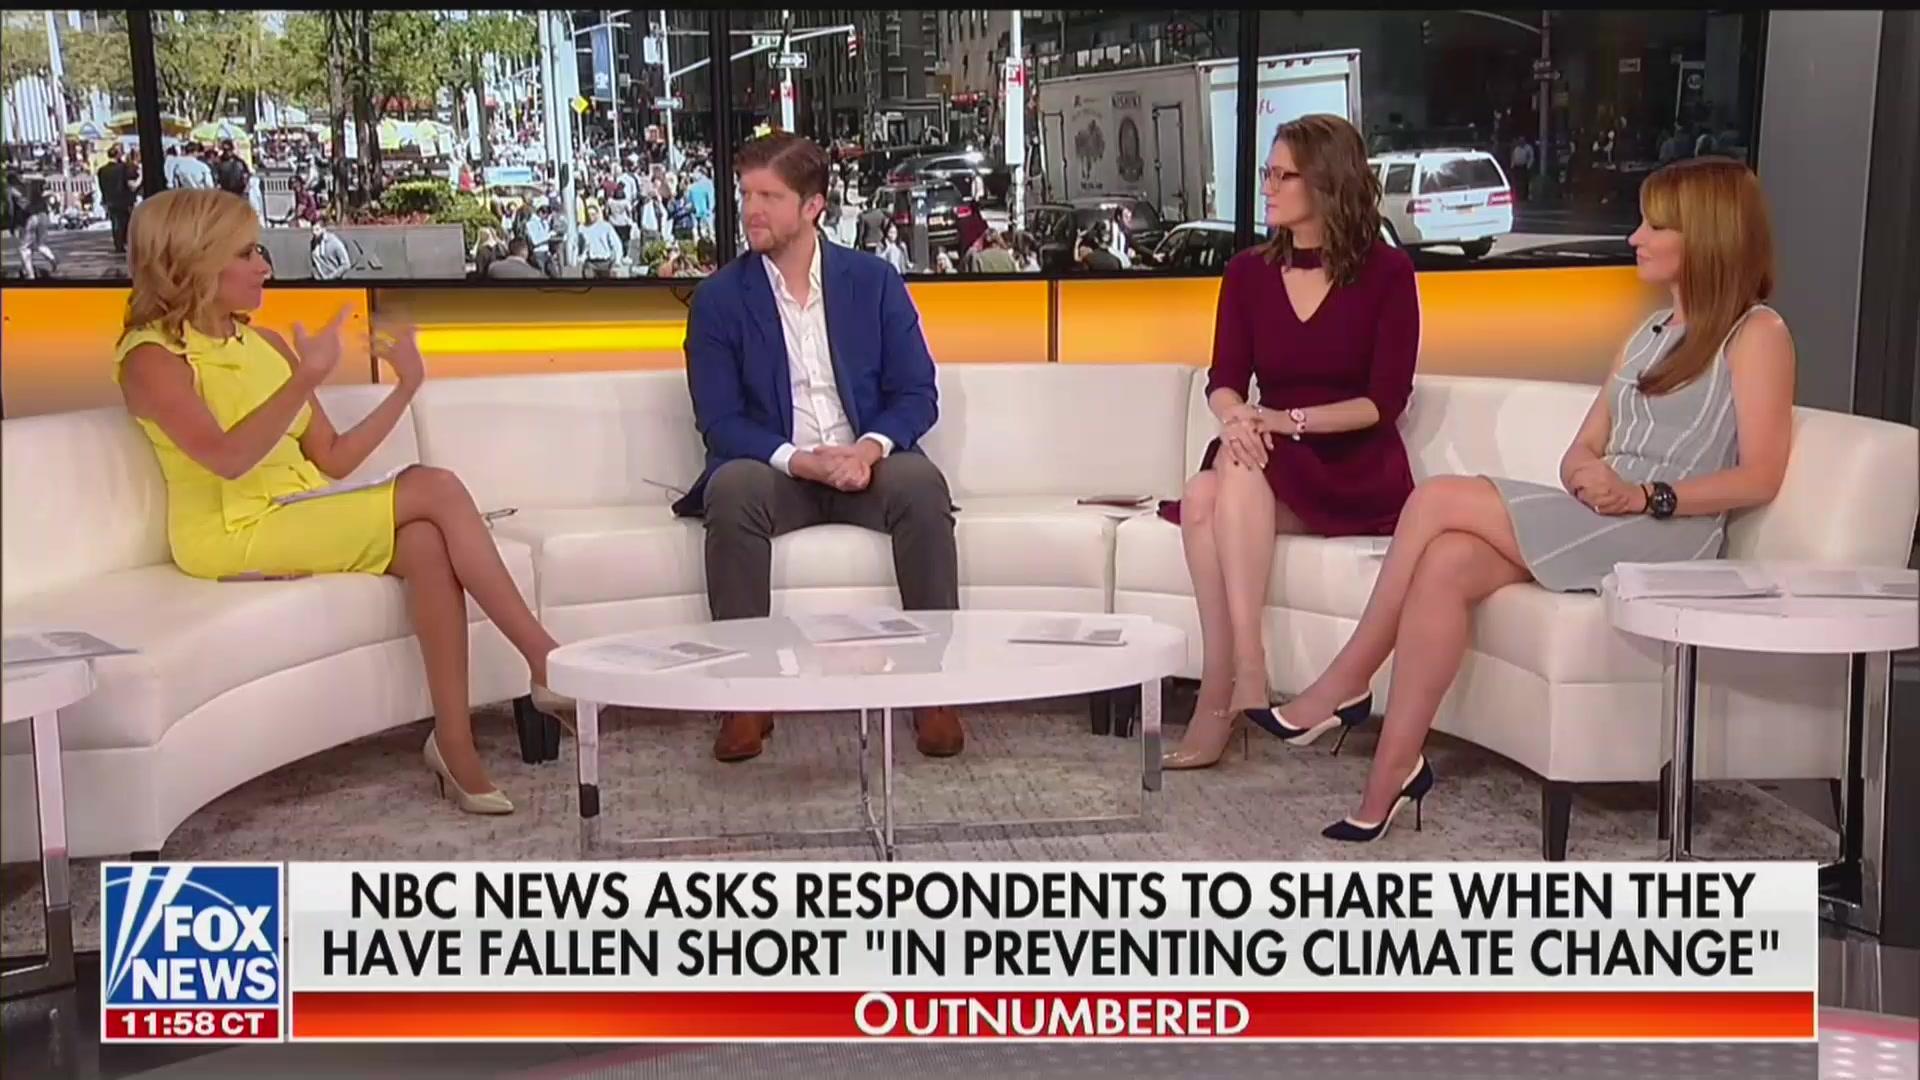 Fox News Hosts Chastise Conservative Pundit for Mocking Greta Thunberg: 'She's a Kid!'